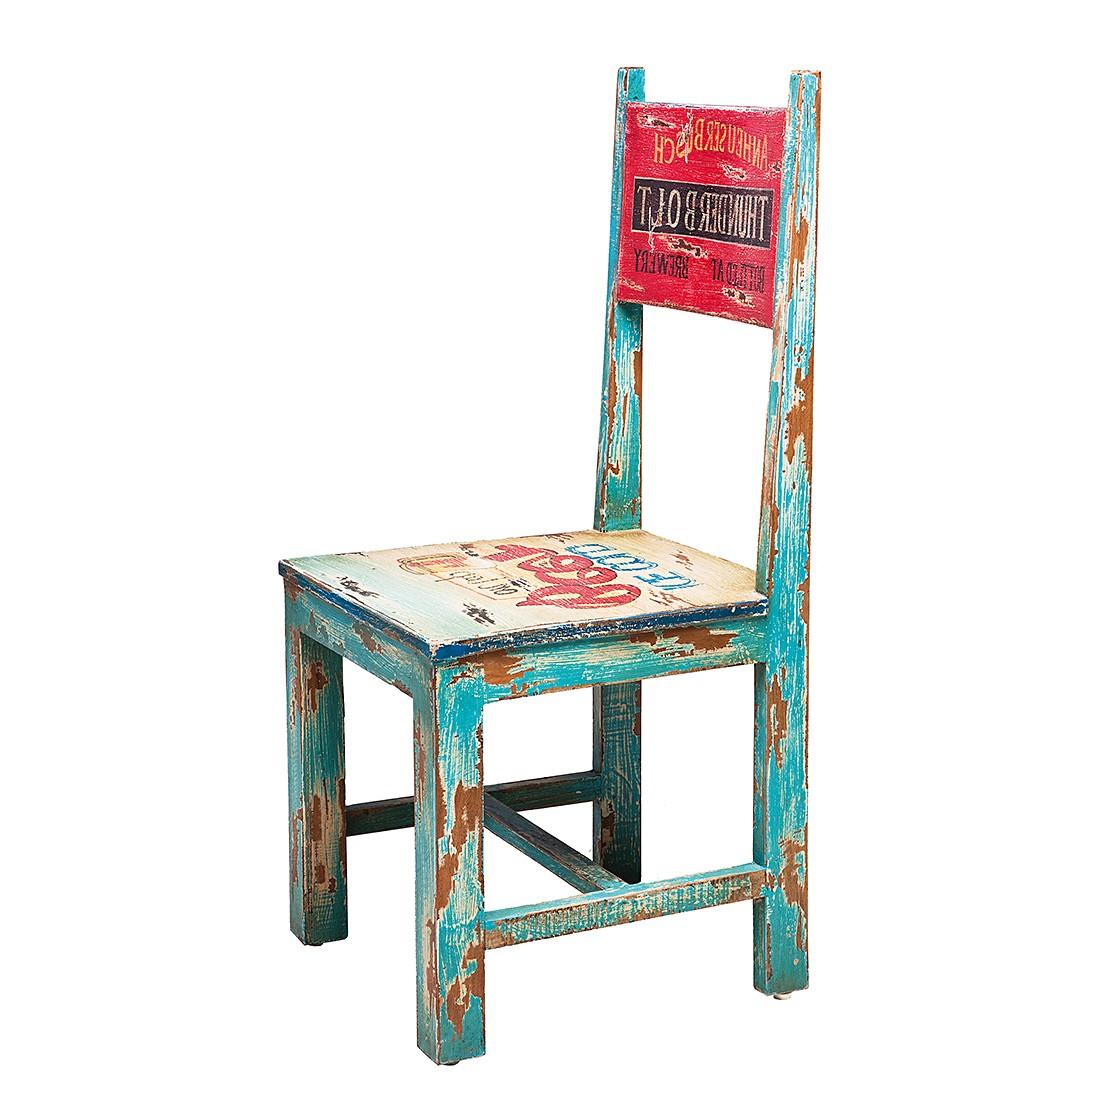 Design stuhl preis vergleich 2016 - Kare design stuhl ...